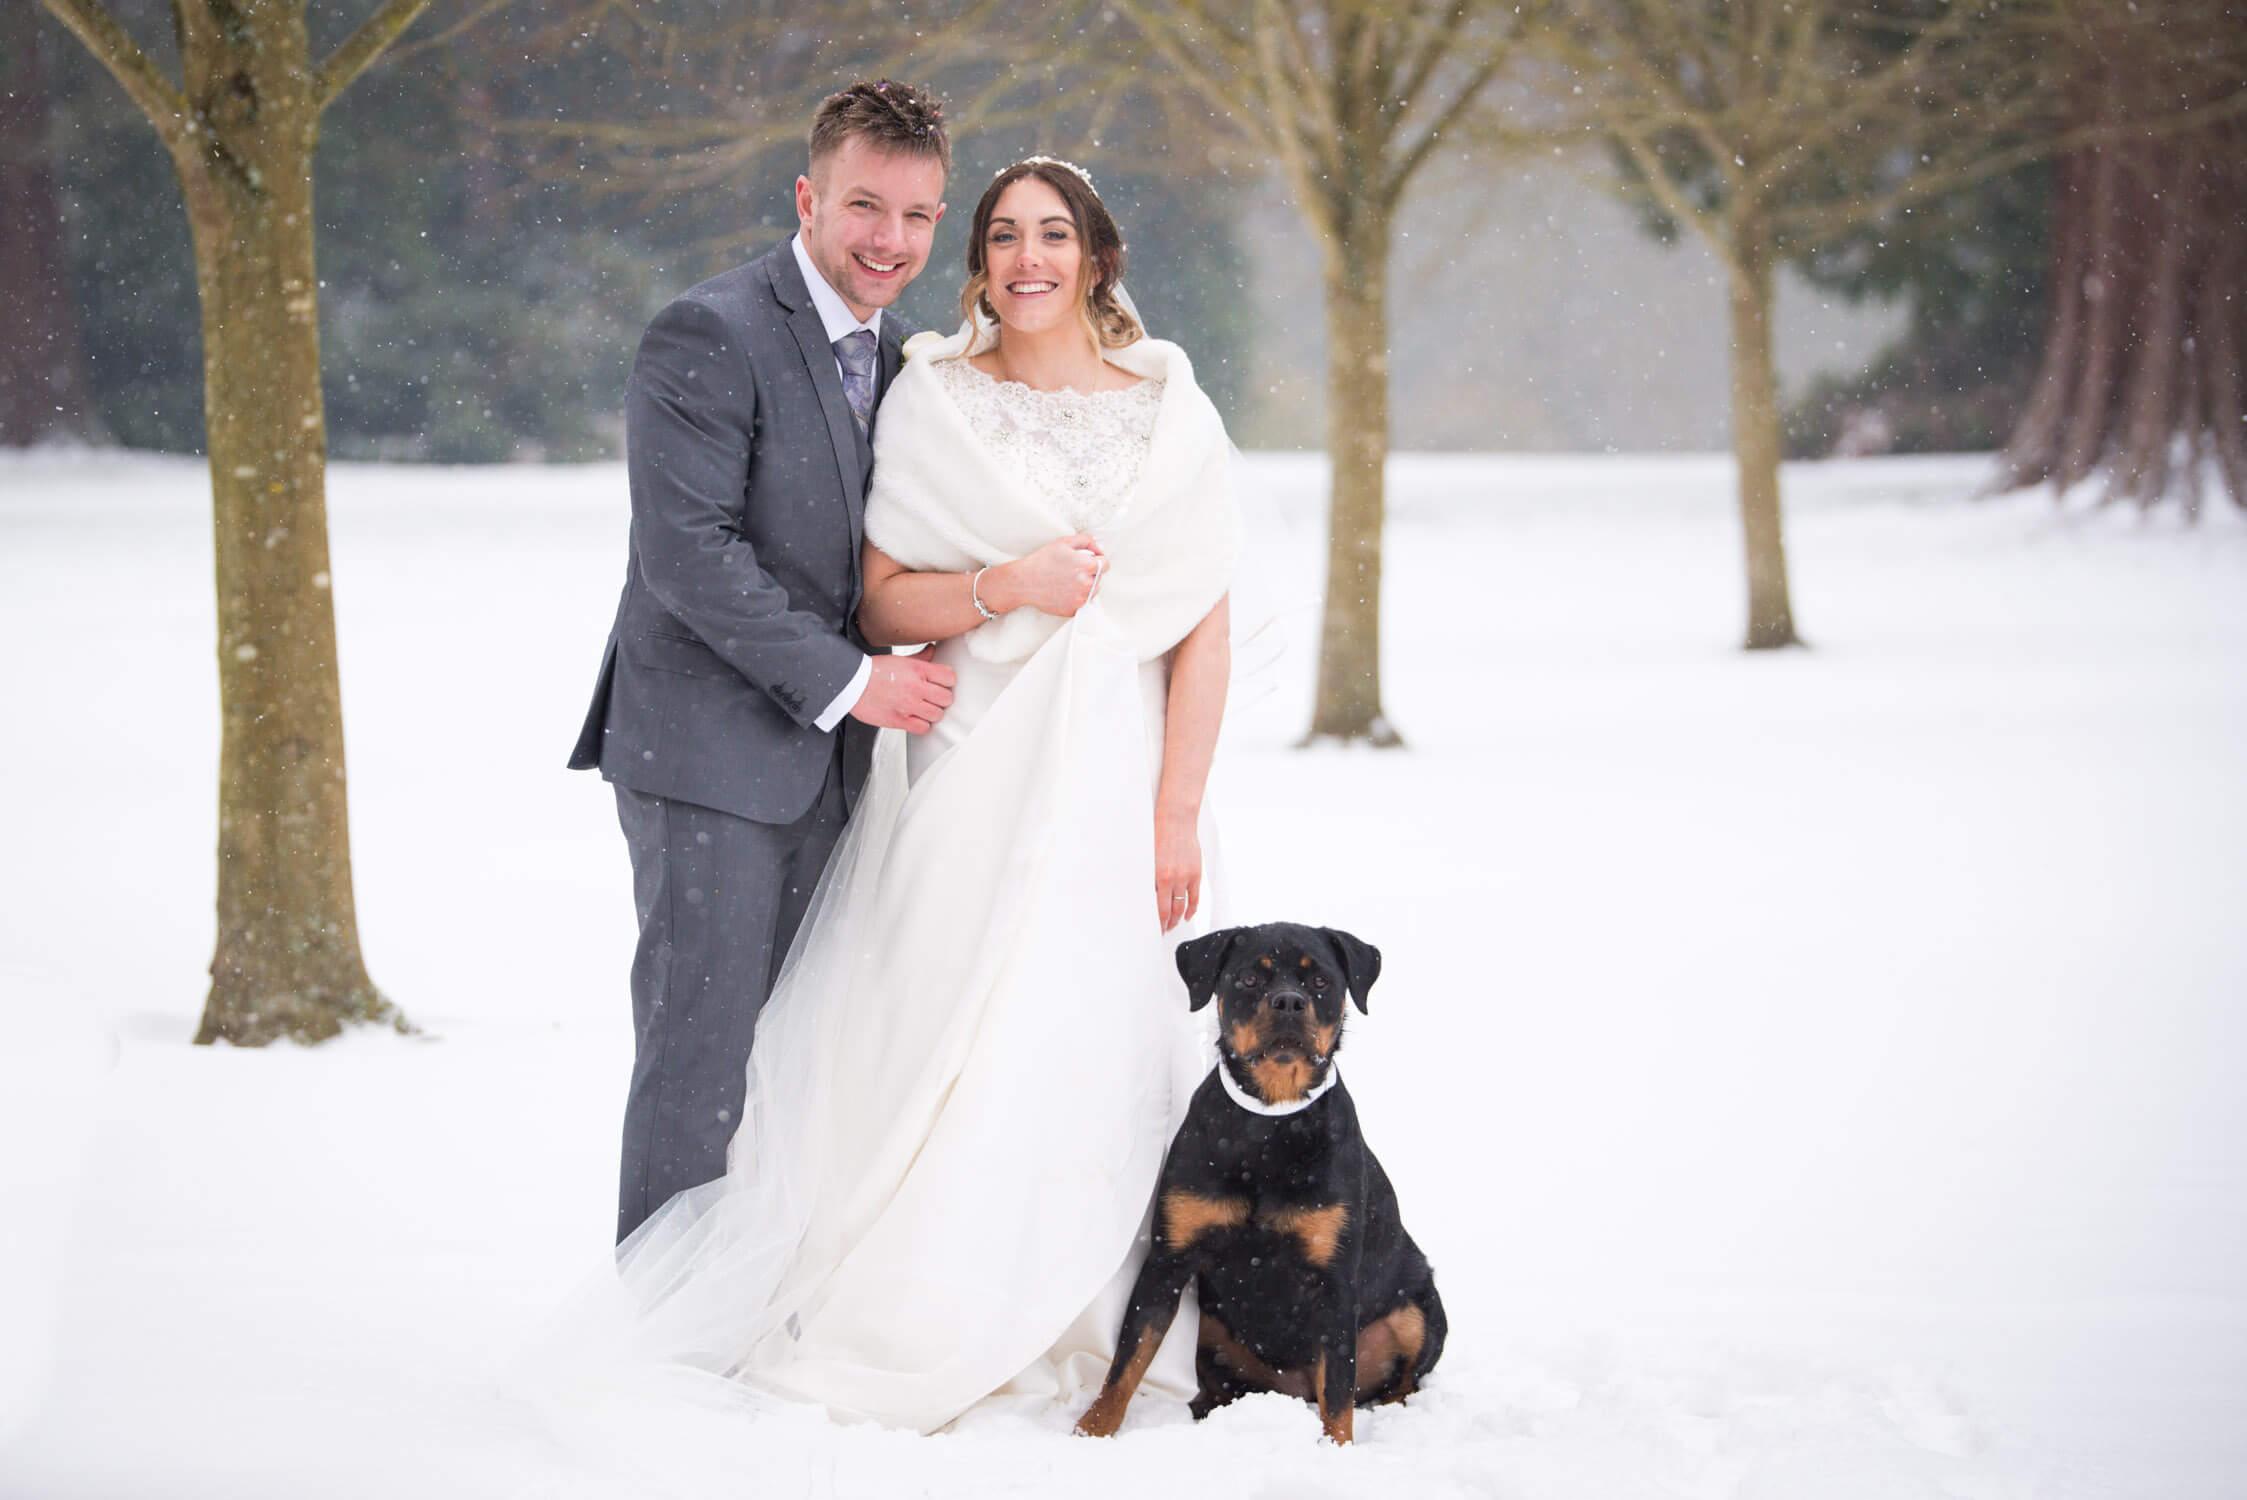 Winter Wedding at Tylney Hall